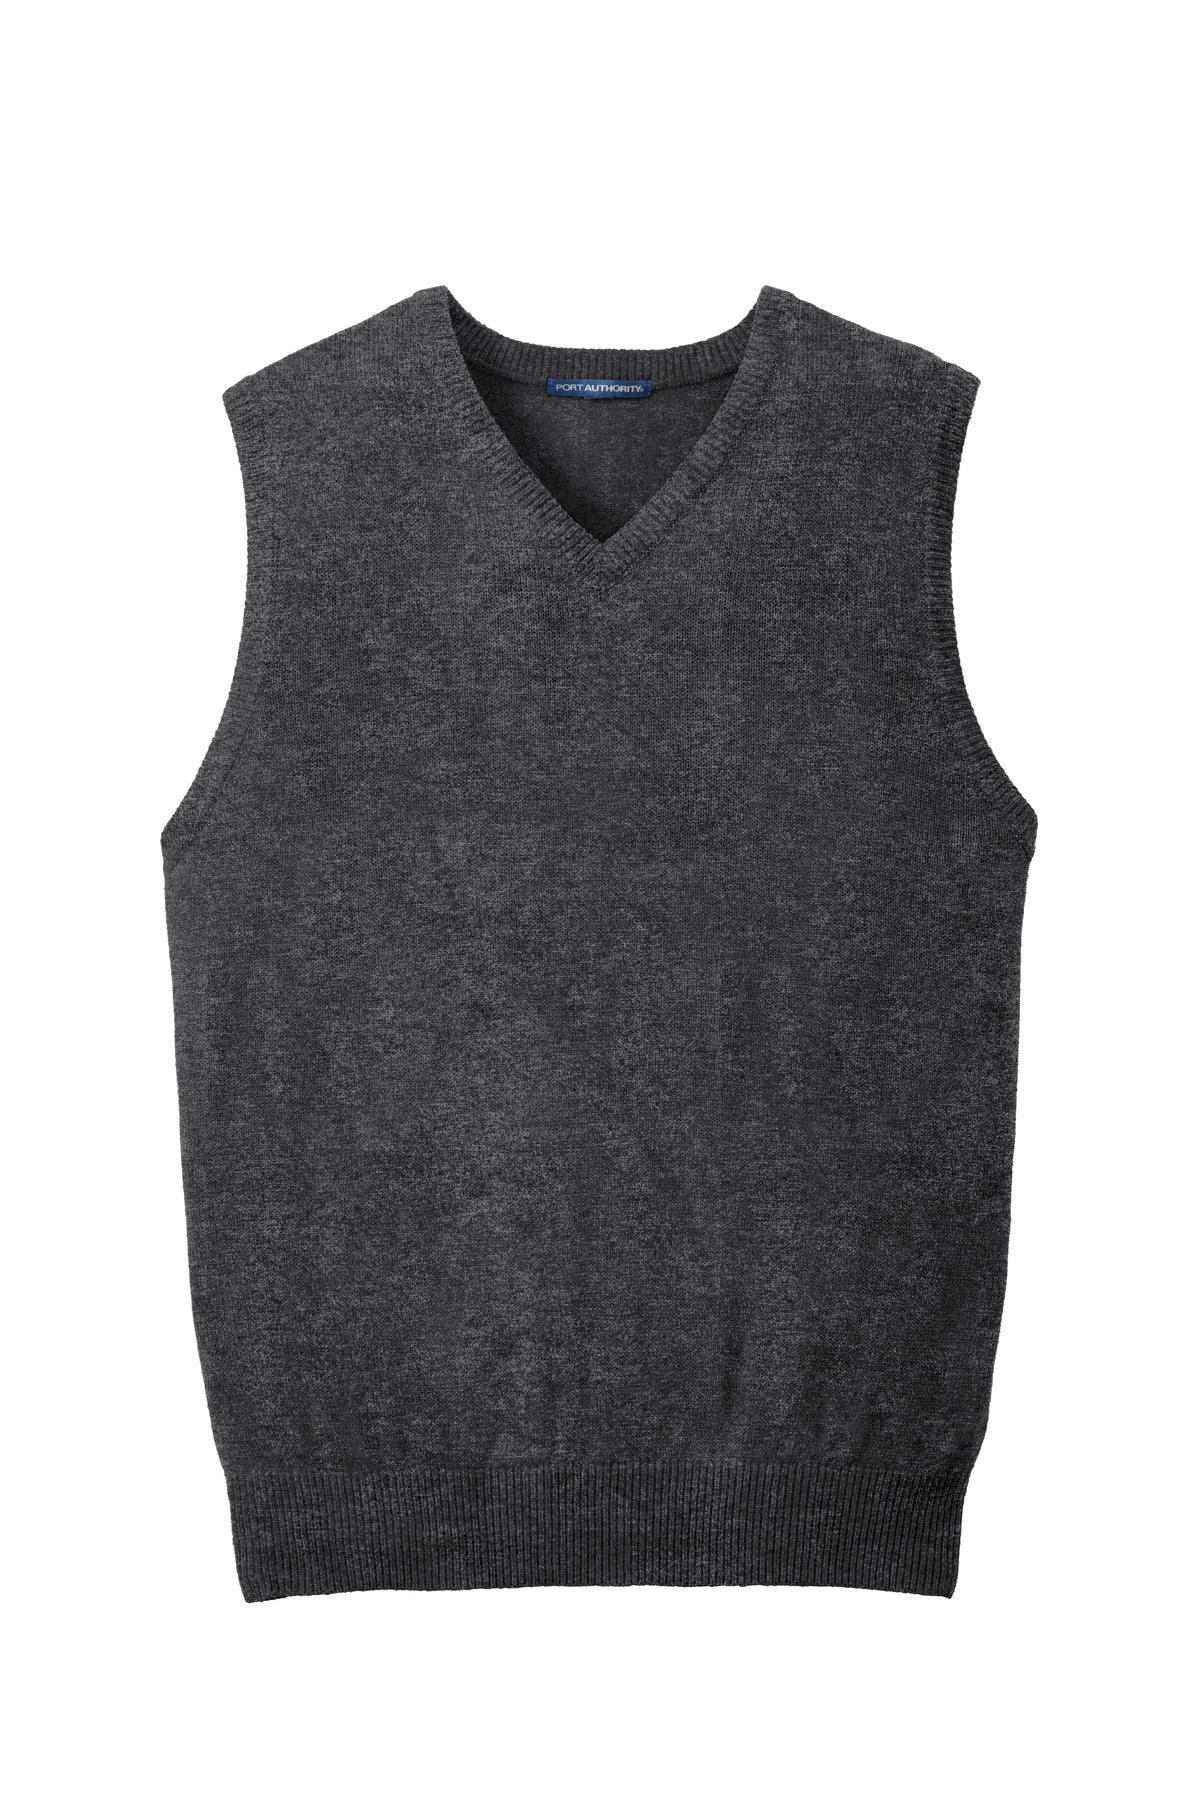 b590ad156f Port Authority® Value V-Neck Sweater Vest